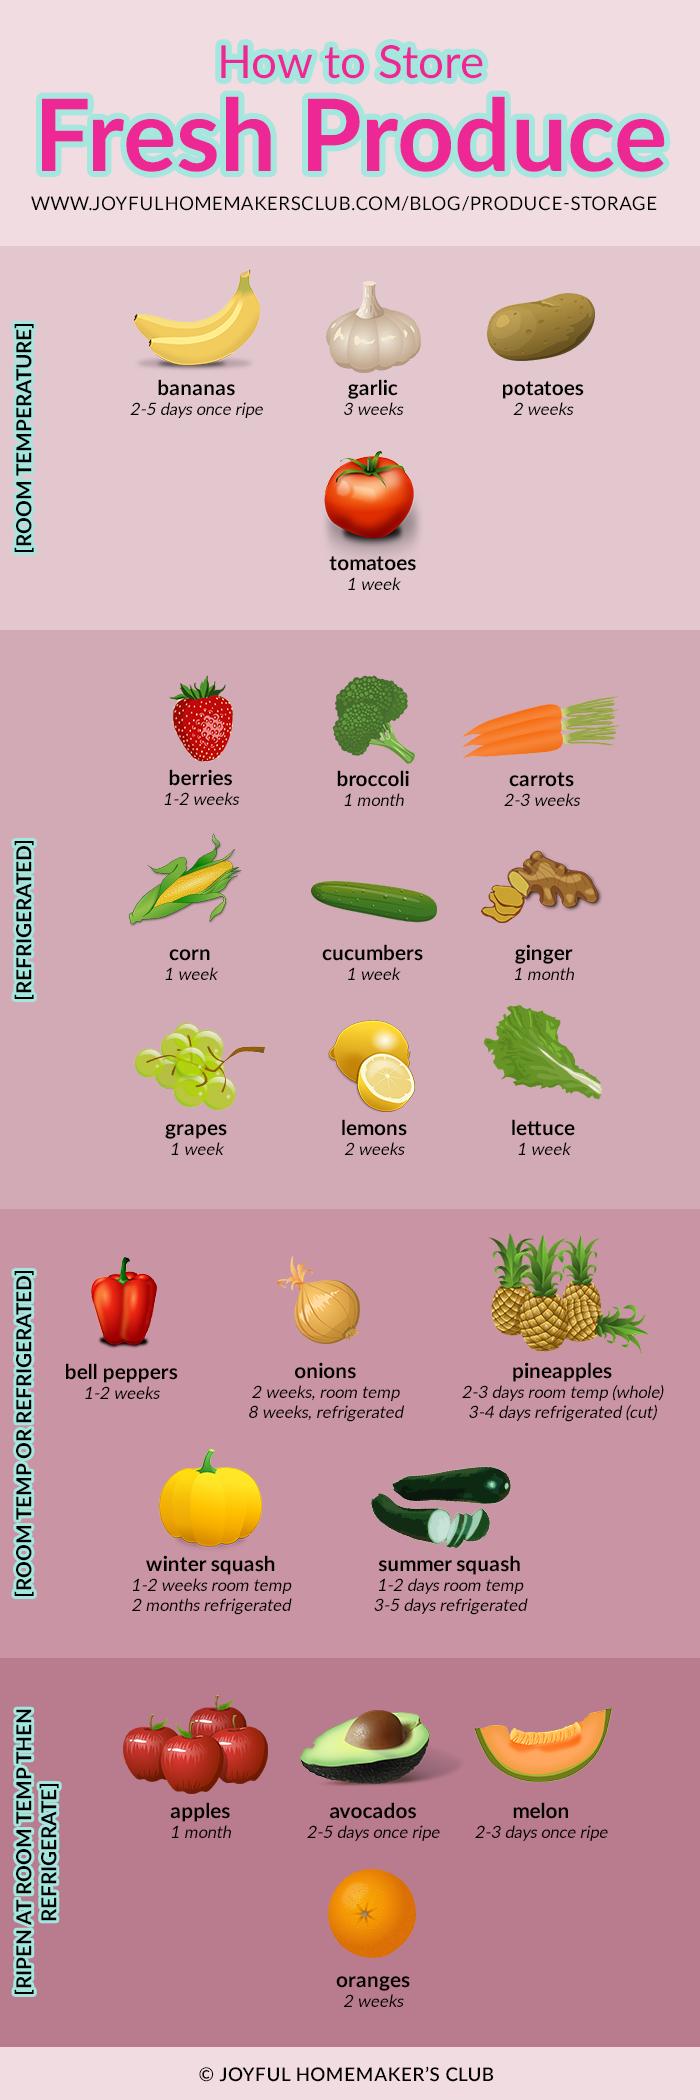 a guide for how to store common fruits and veggies #inthekitchen #homemaking #christianhomemaker #inthefridge #inmyfridge #organization